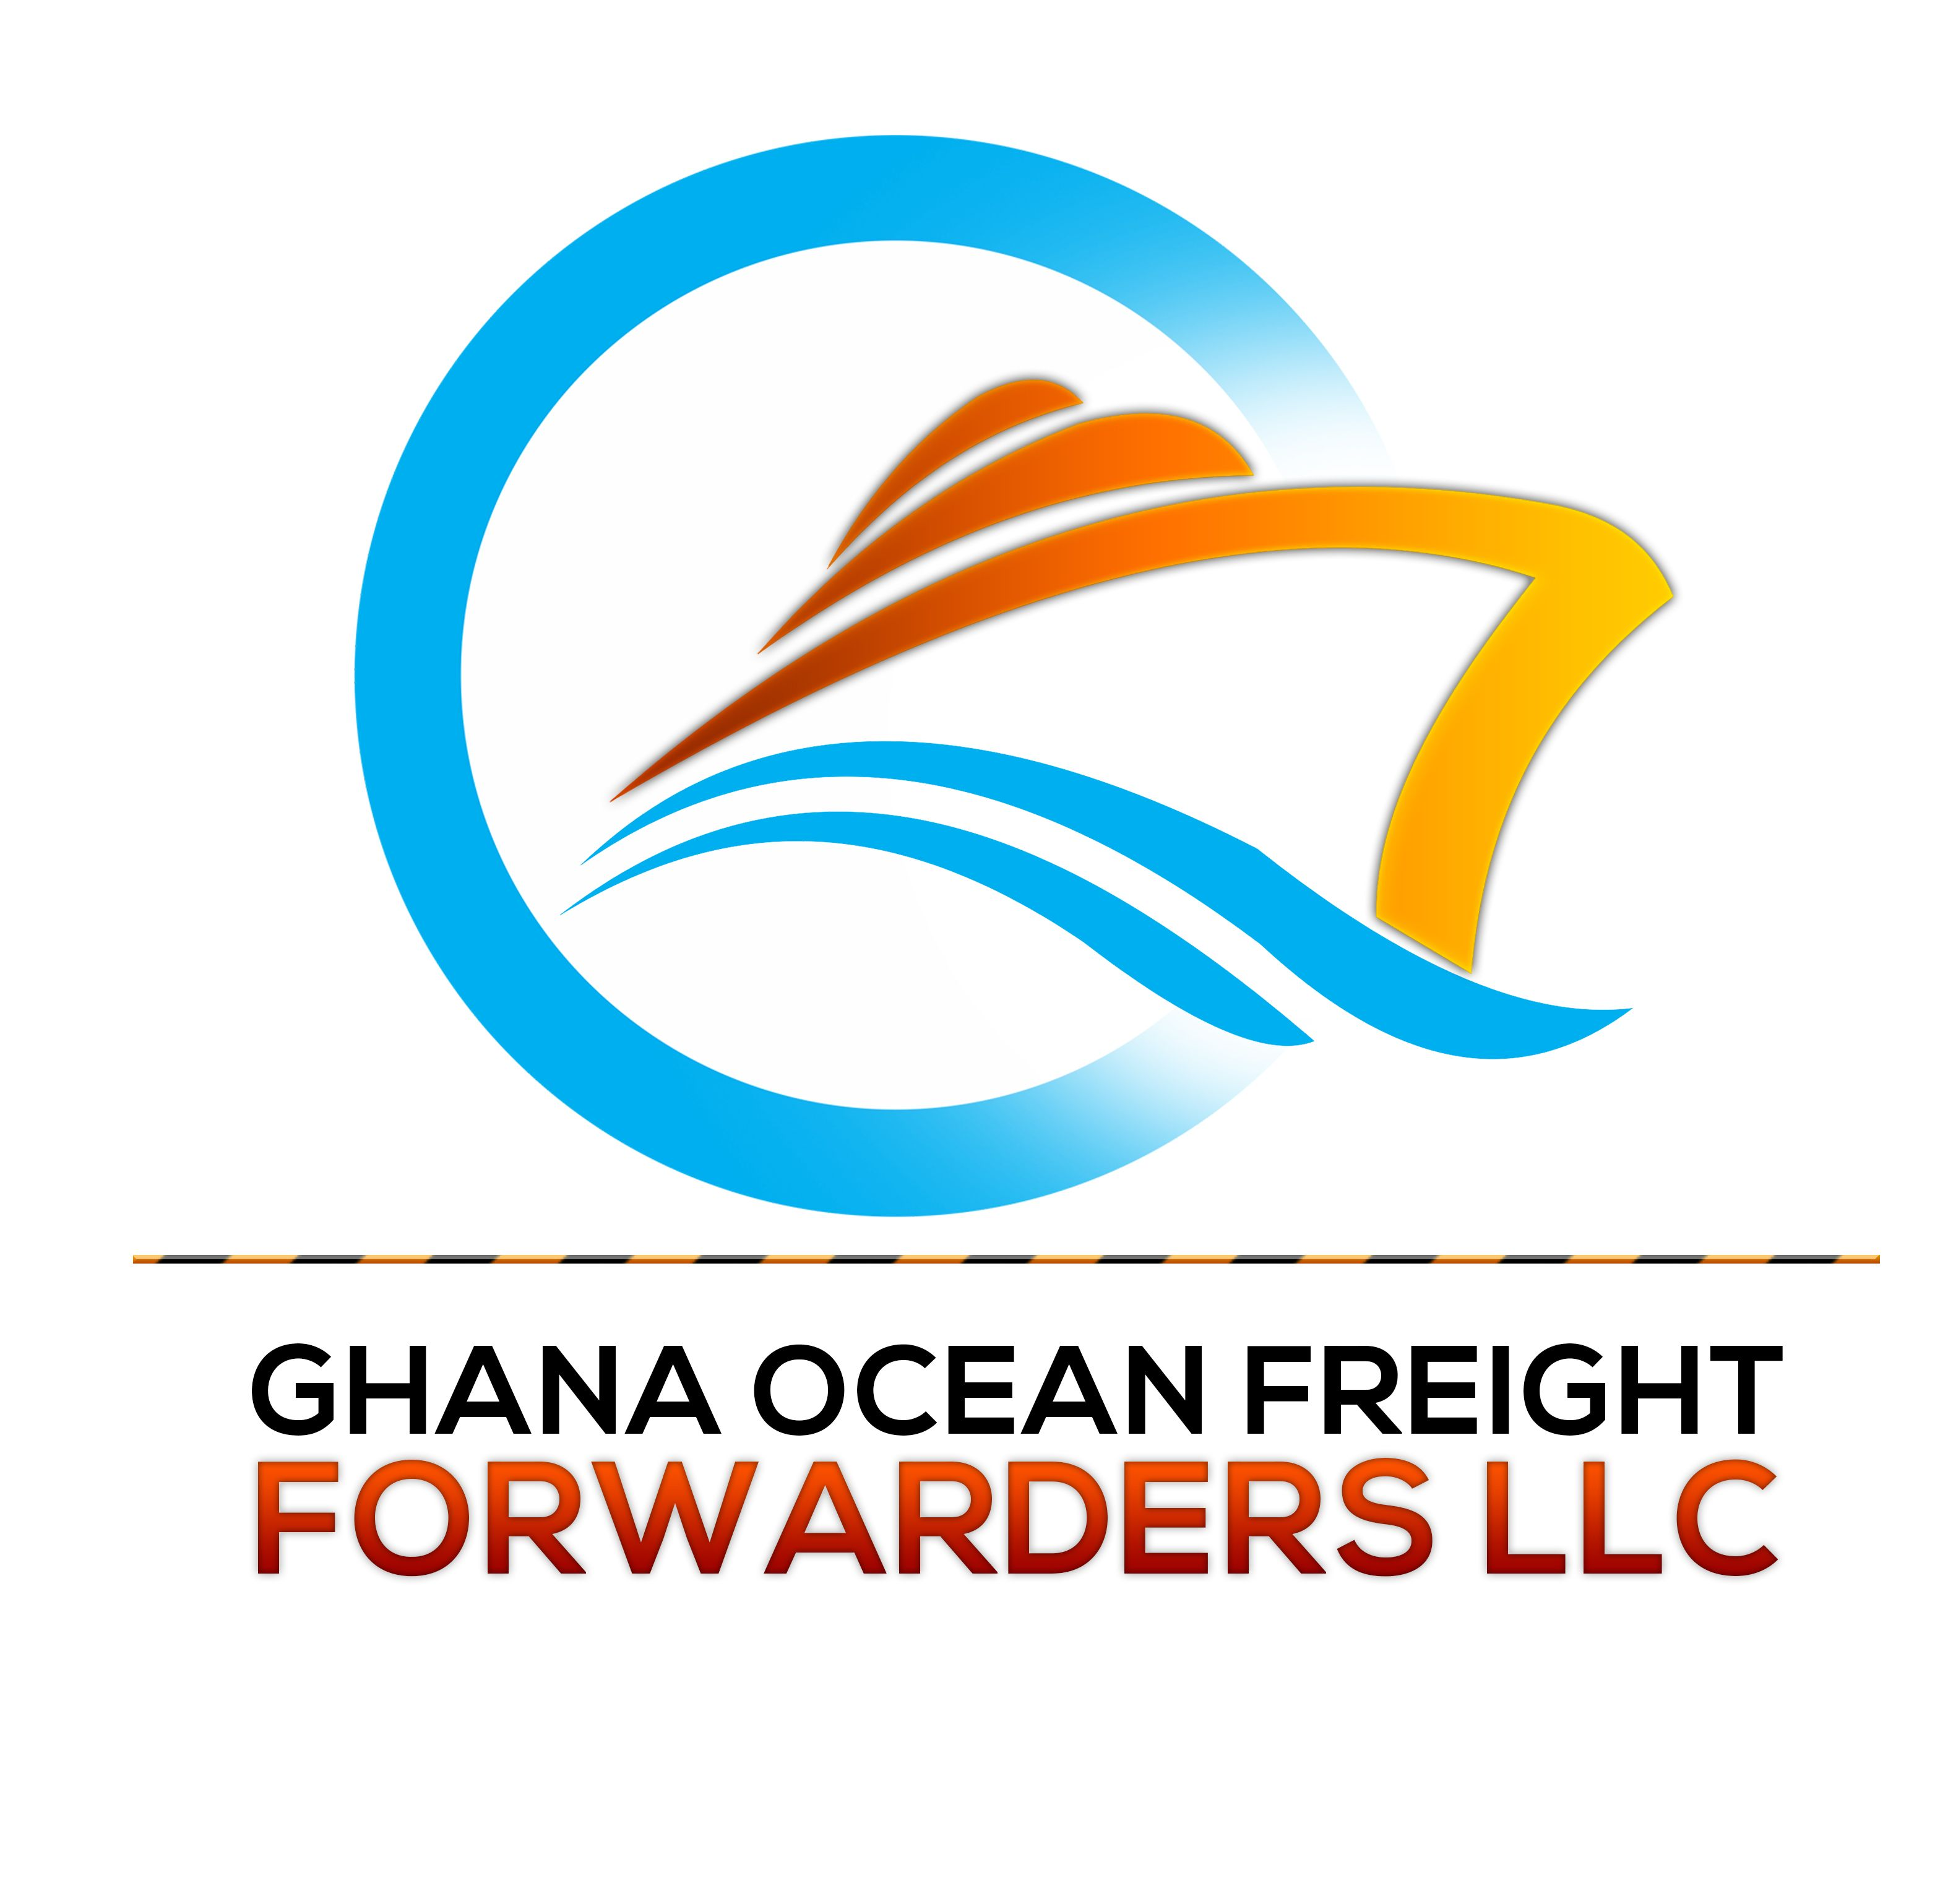 Ghana Ocean Freight Forwarders LLC Logo